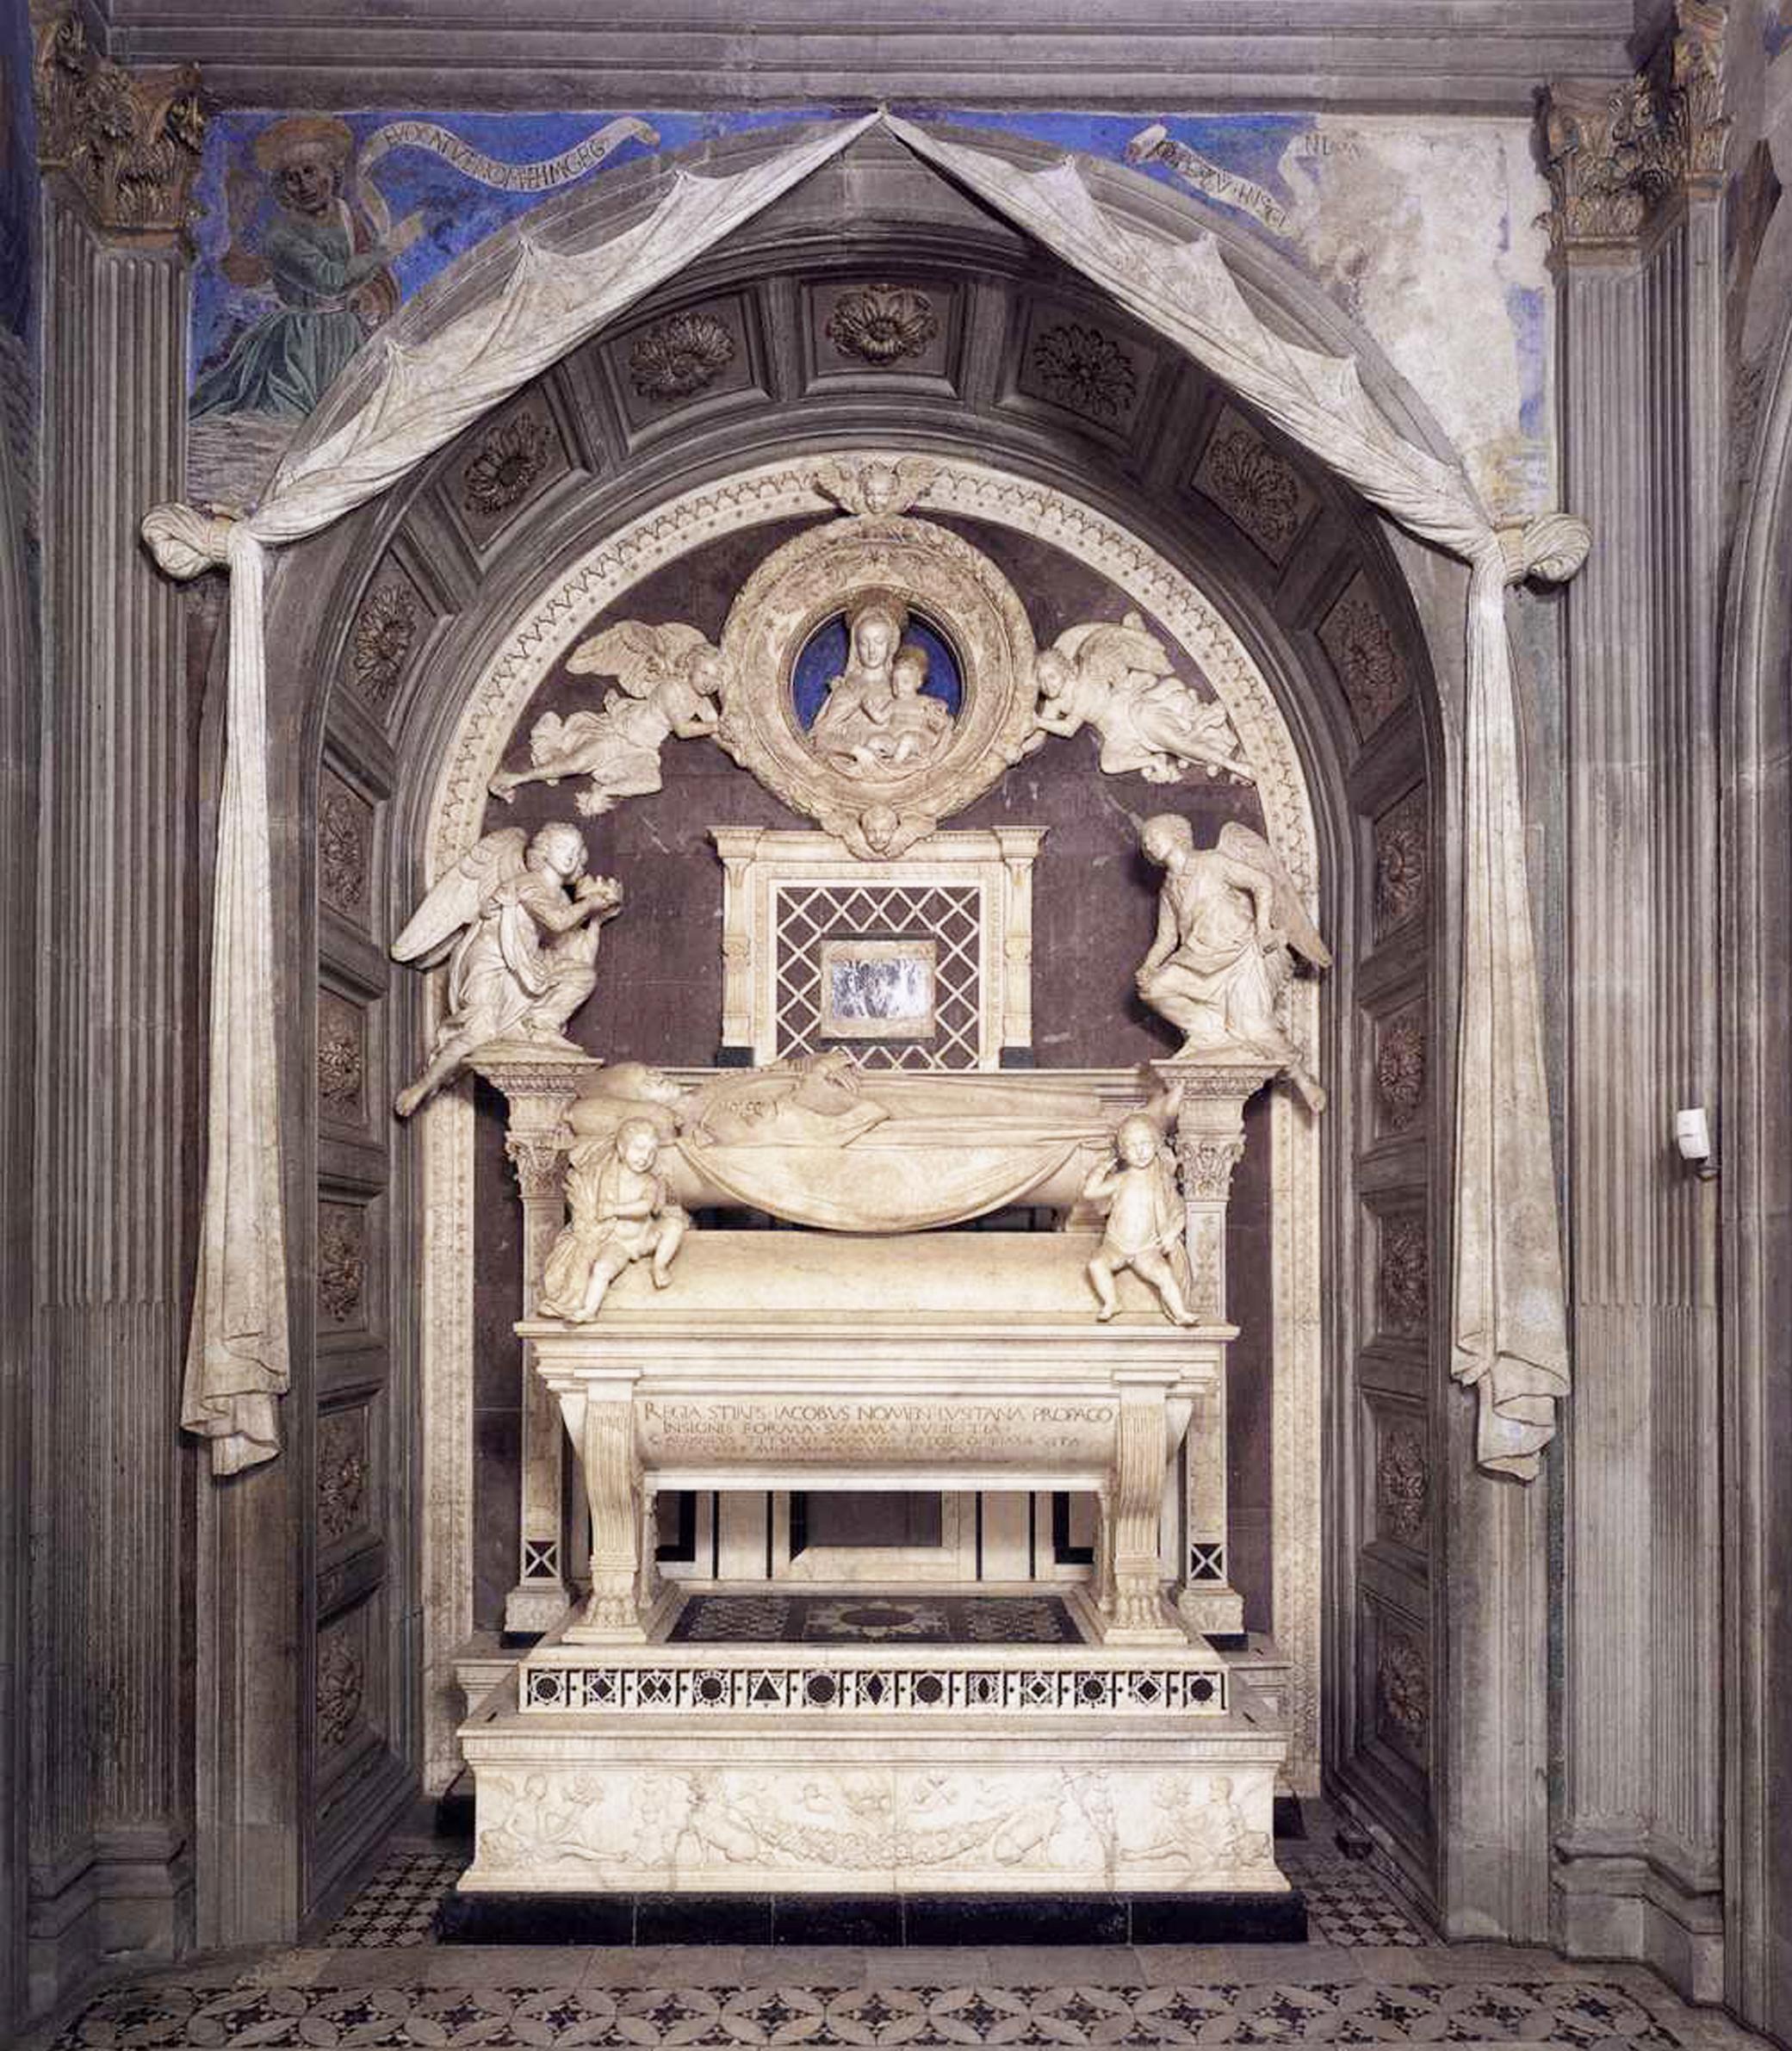 31 Cardinal of Portugal chapel monument wall B